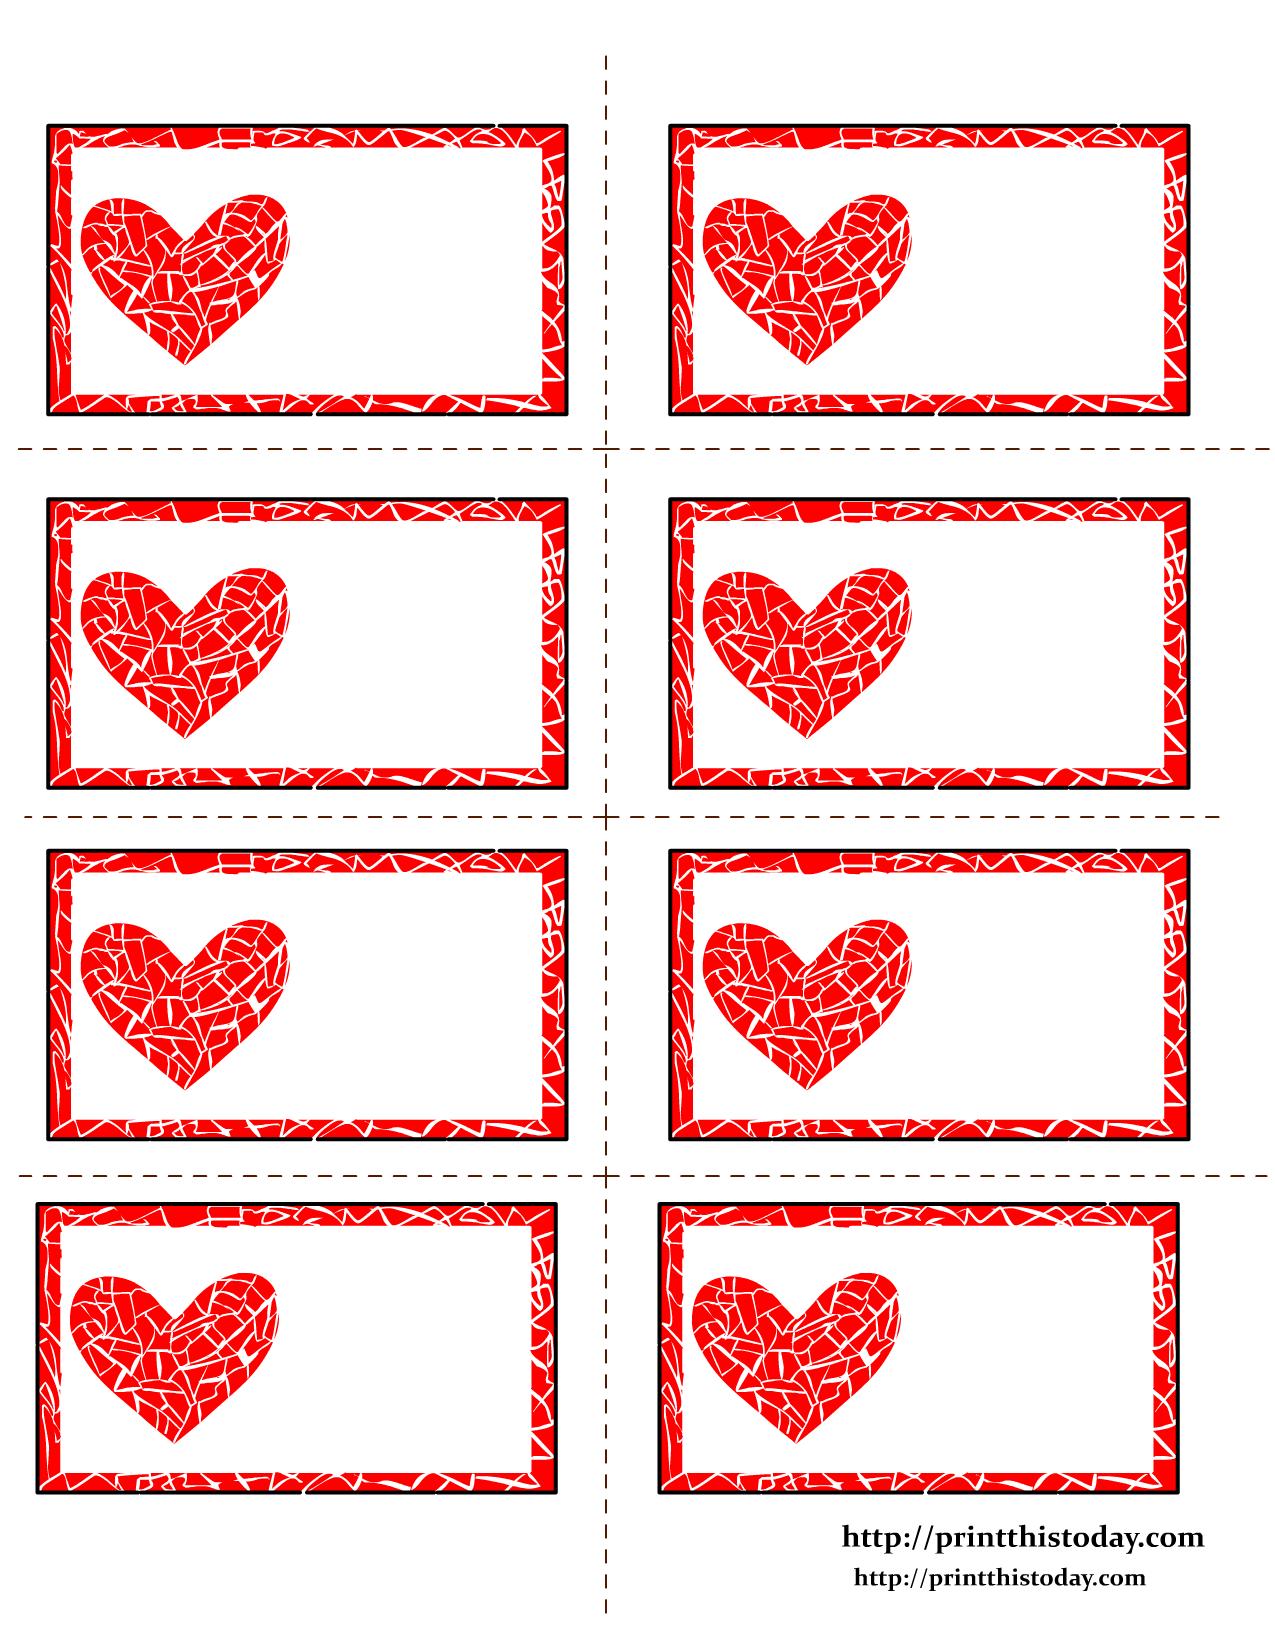 7157791a98b9 Free Printable Valentines Day Labels Pictogramme, Bricolage Saint Valentin  Maternelle, Étiquettes Imprimables, Contenus